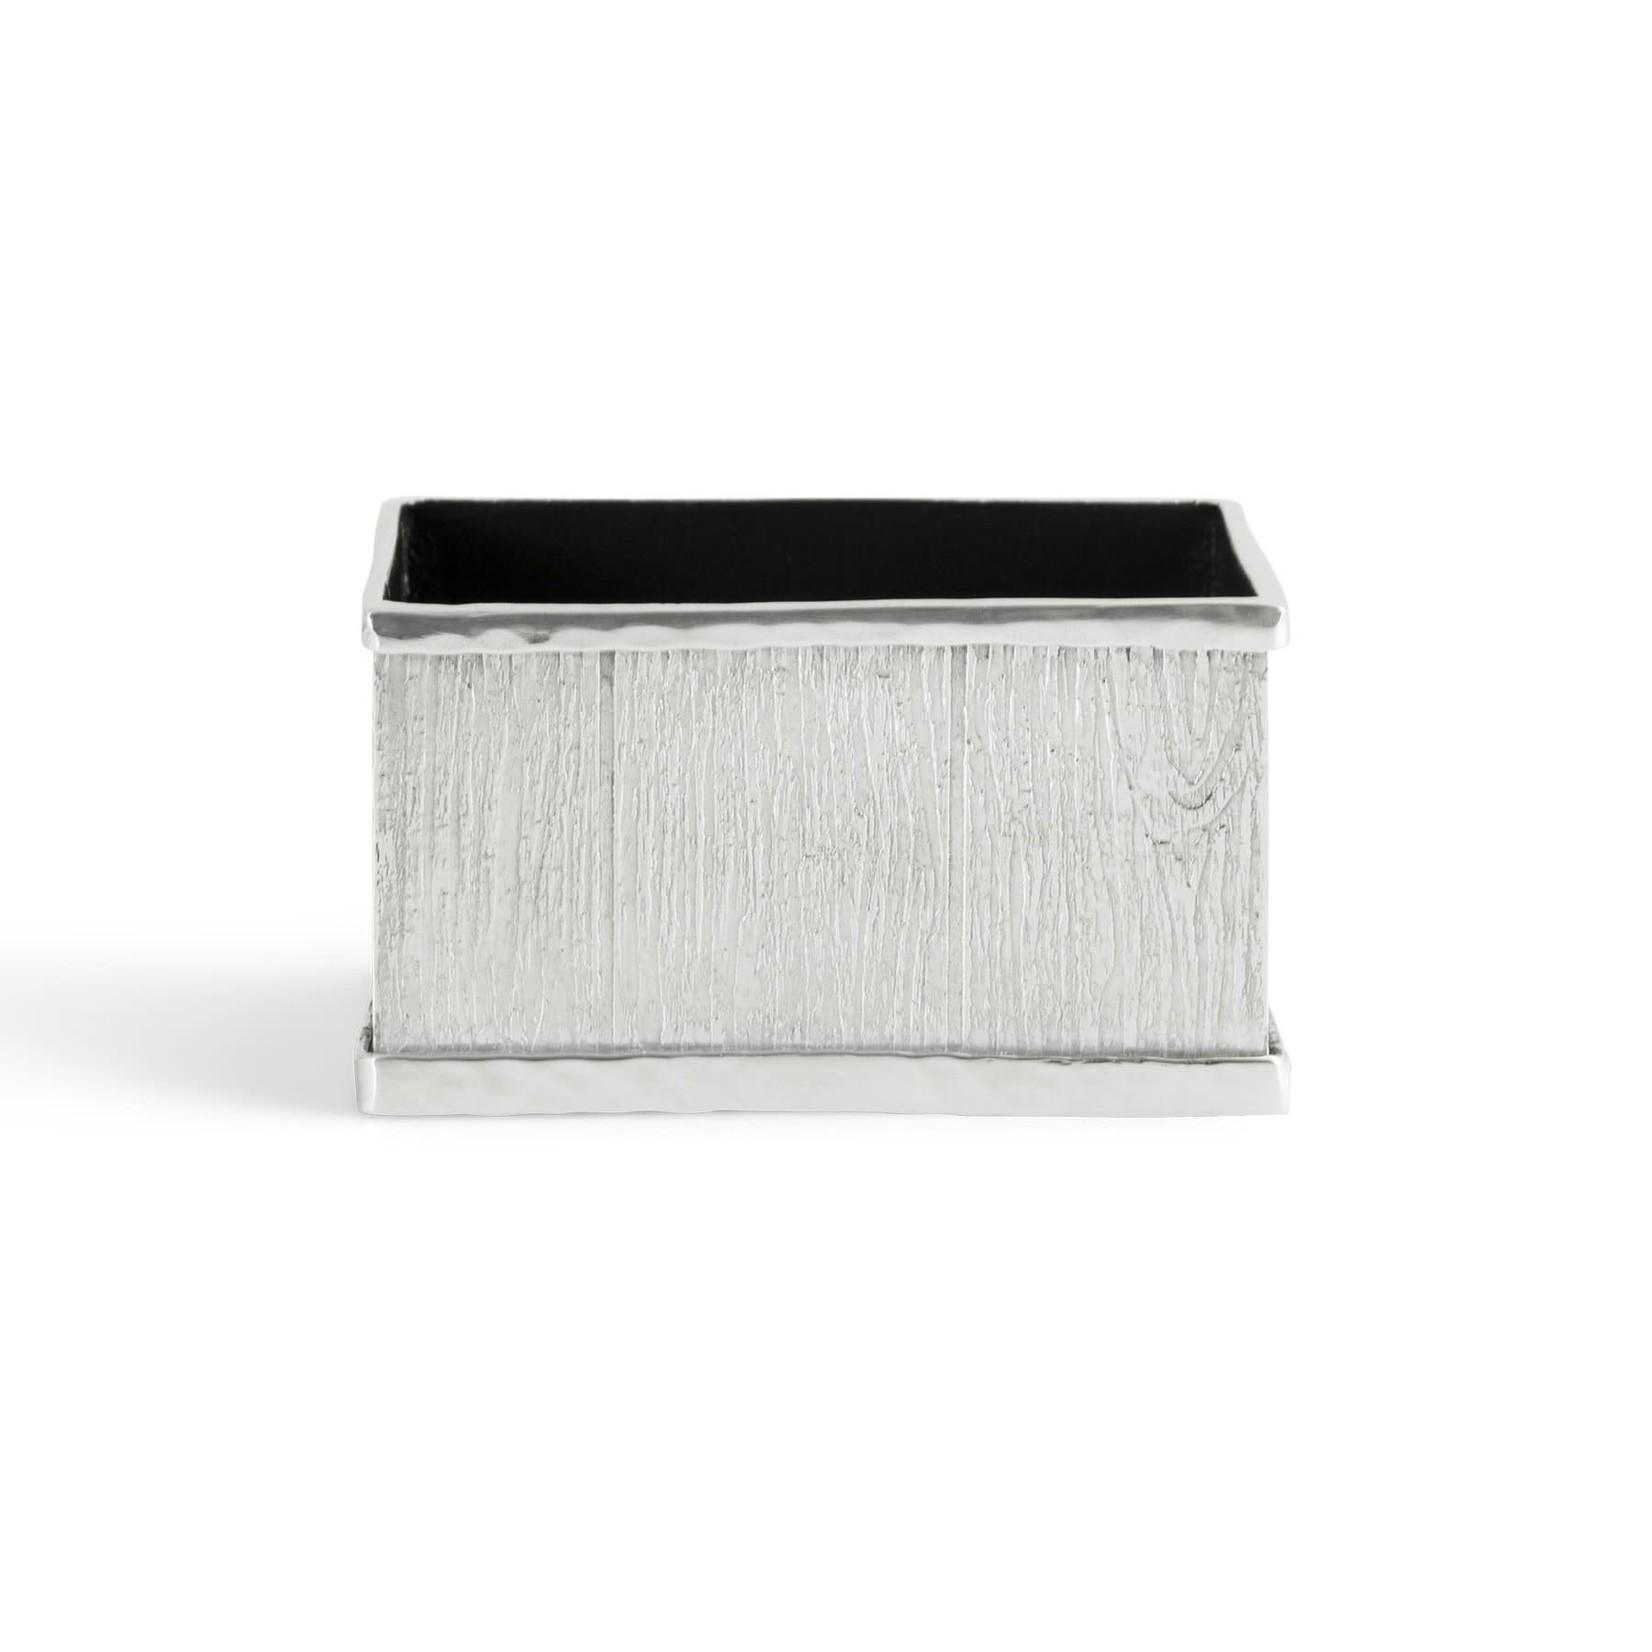 Michael Aram Ivy & Oak Sugar Container